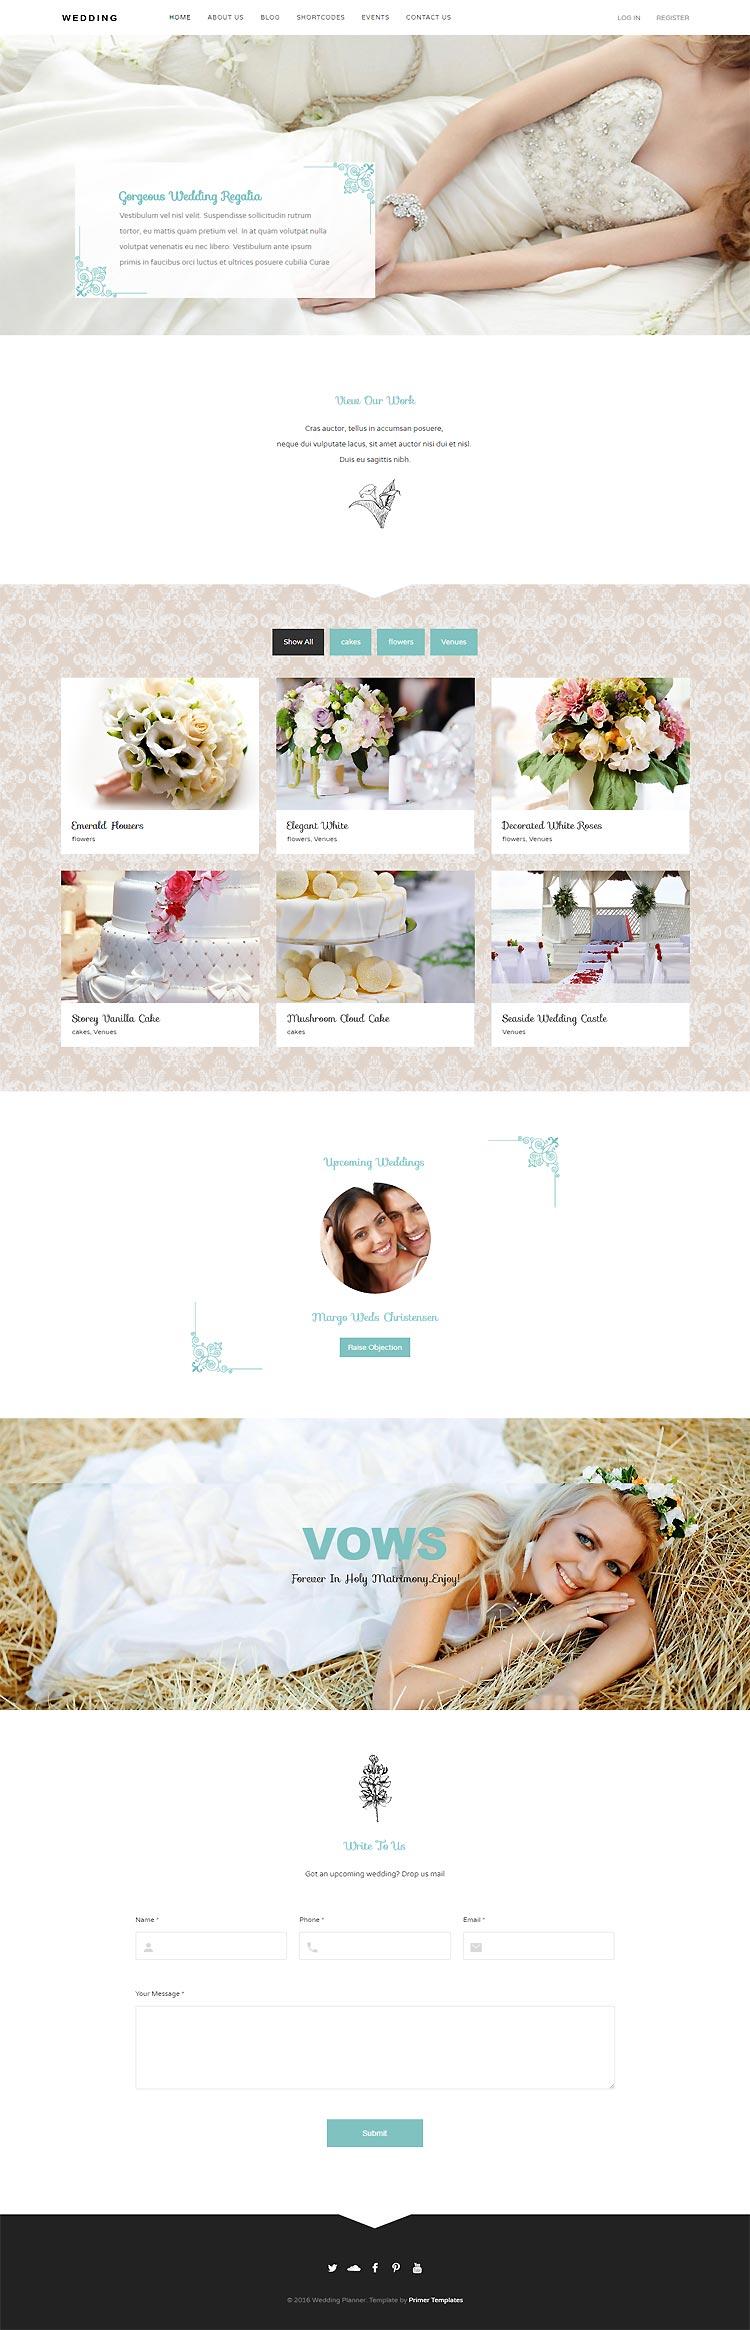 Wedding Joomla! template